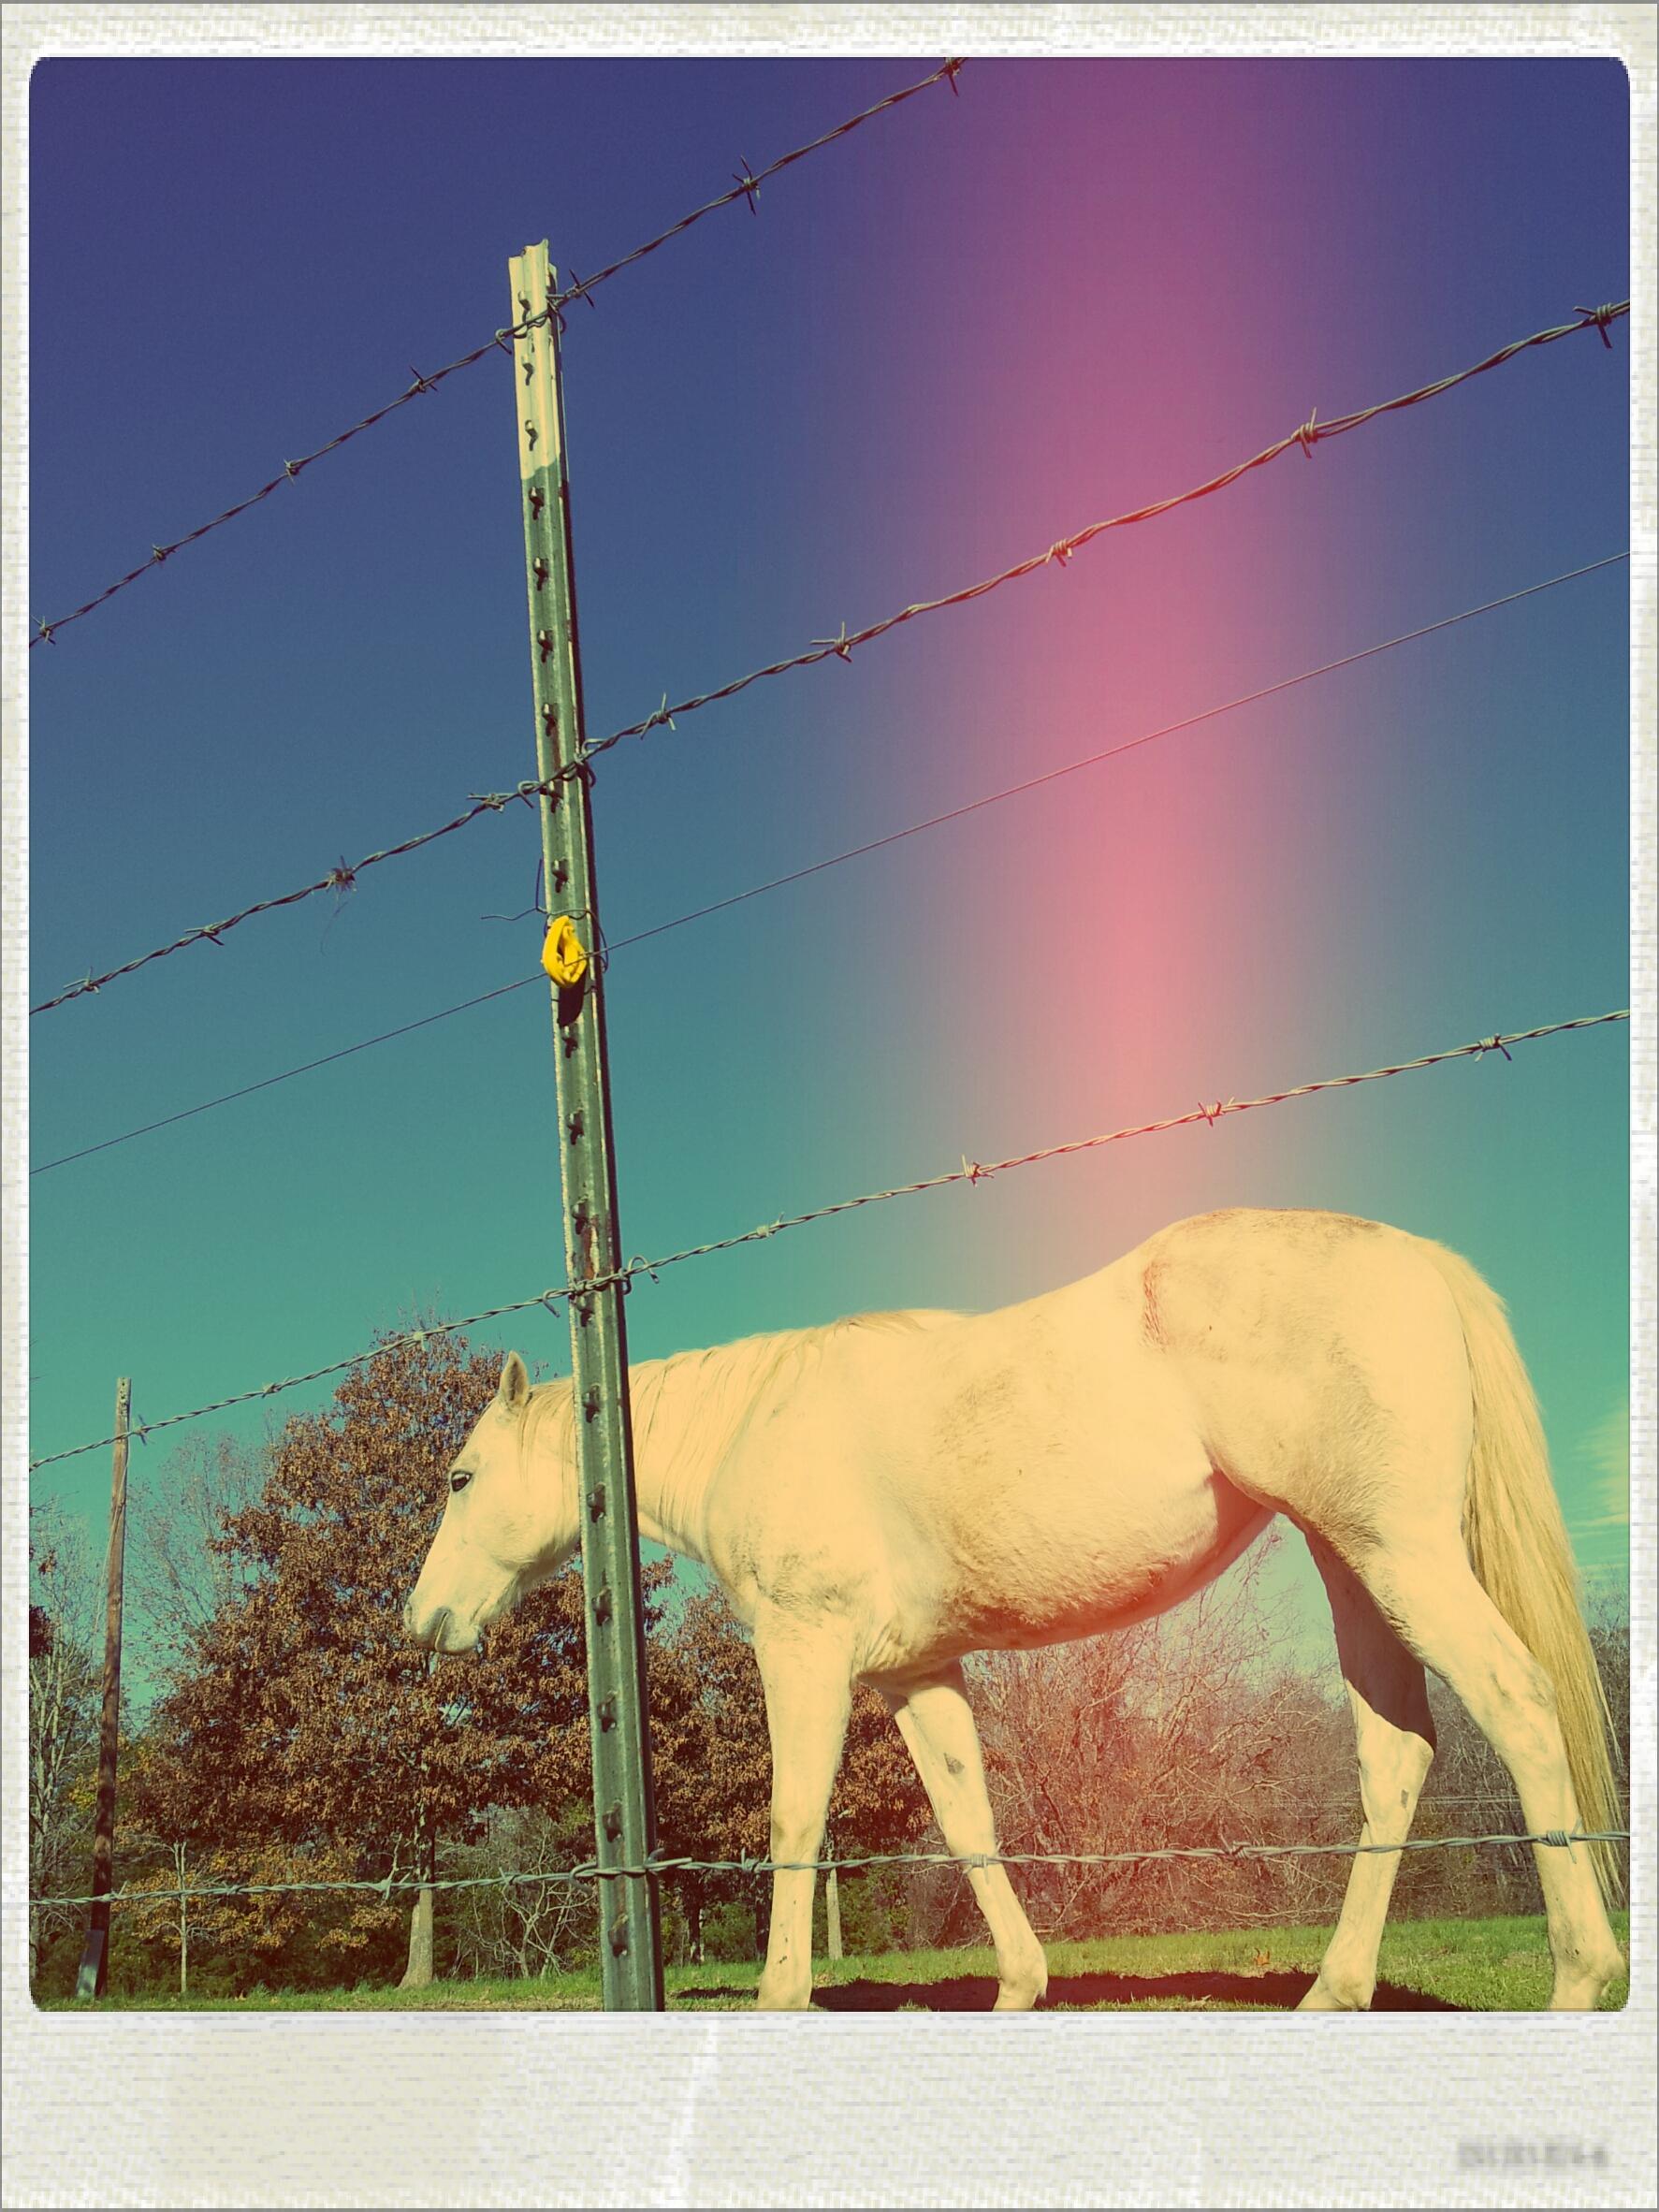 2011-12-30 14.41.10 - Aladin,Local,Nolaroid.jpg